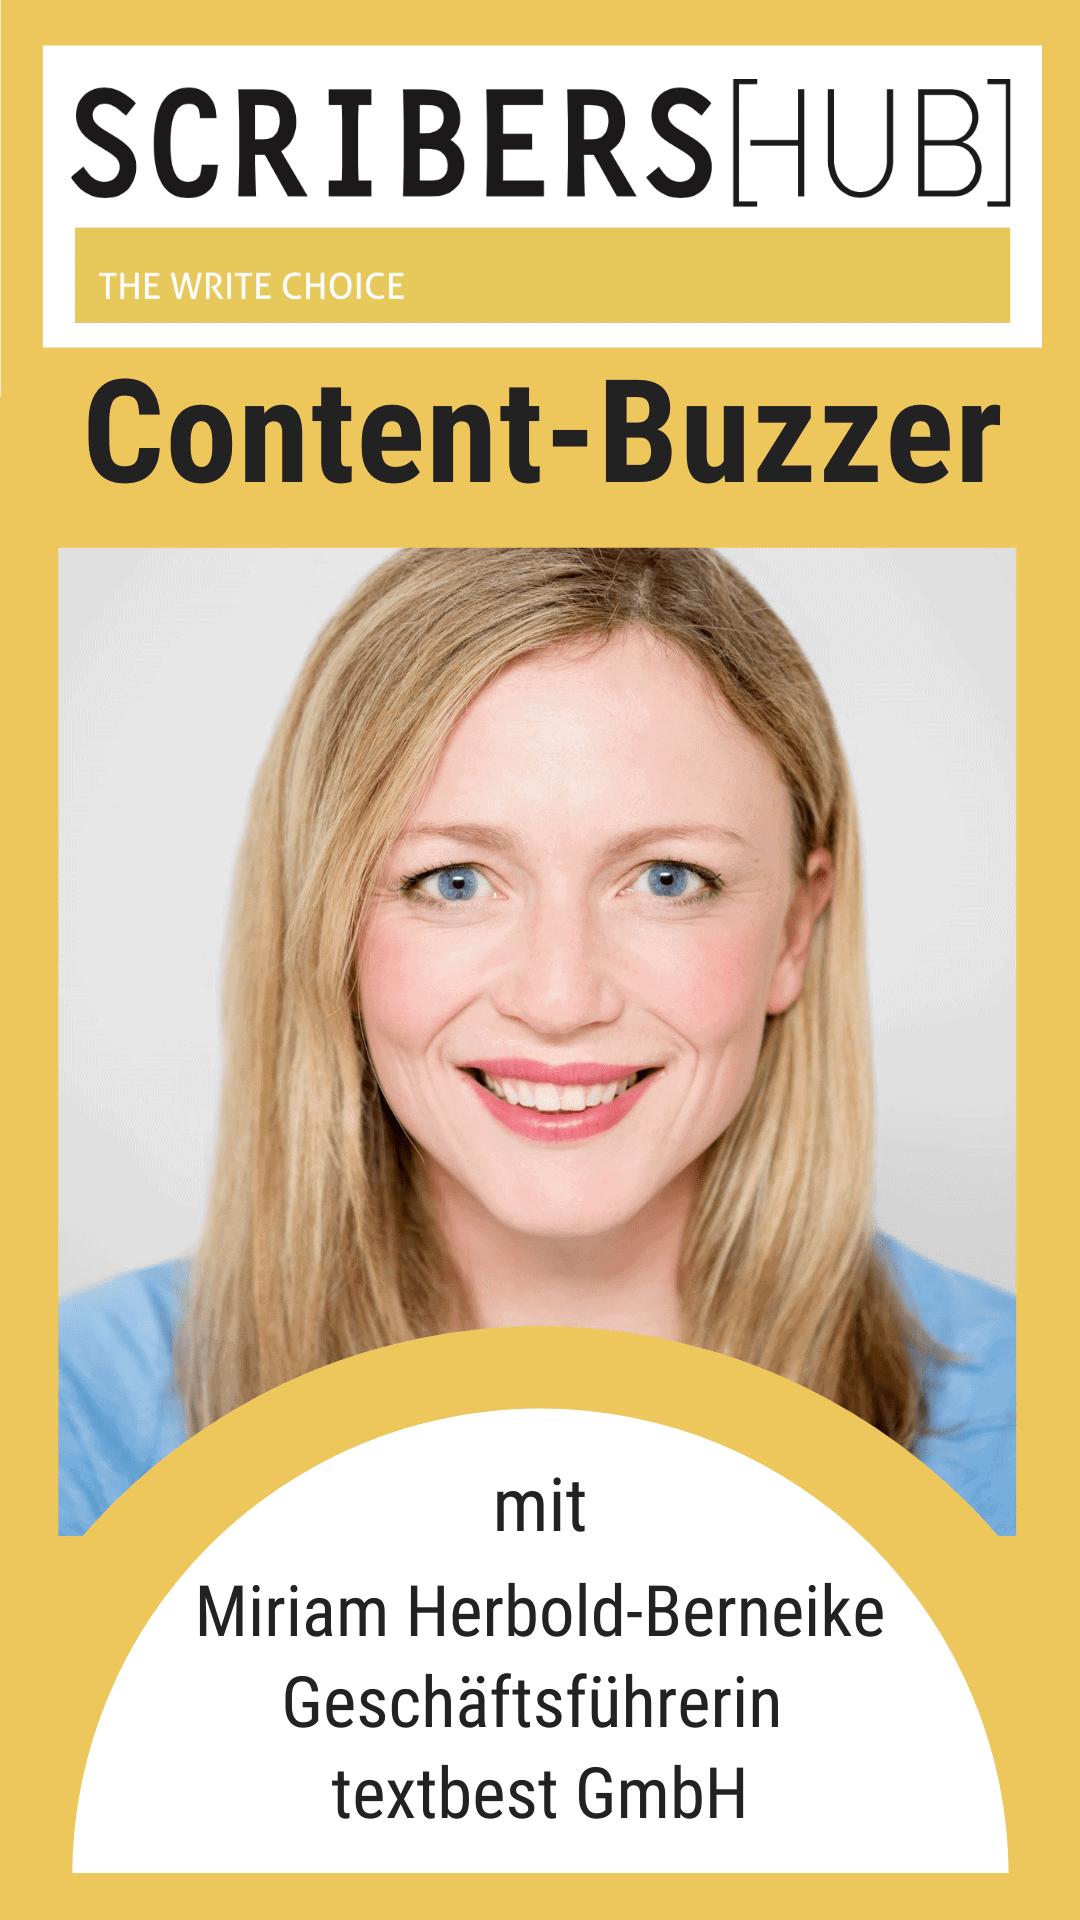 Scribershub Content Buzzer mit Miriam Herbold Berneike